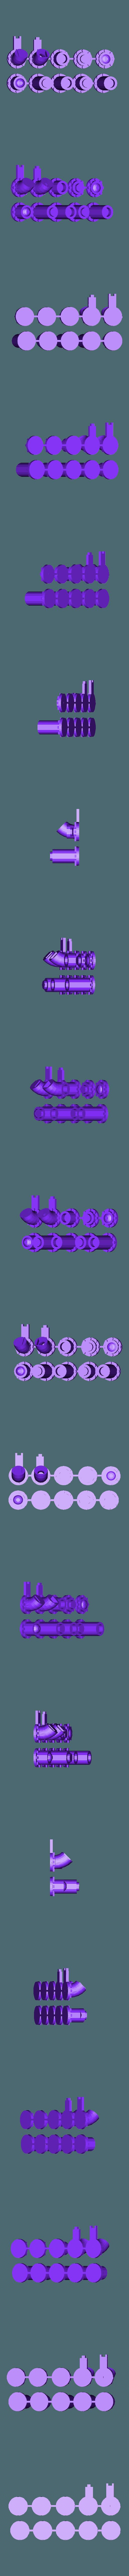 big_turret_side_pipes_hm.stl Download free STL file Big Plasma Cannon Turret • 3D printing design, JtStrait72